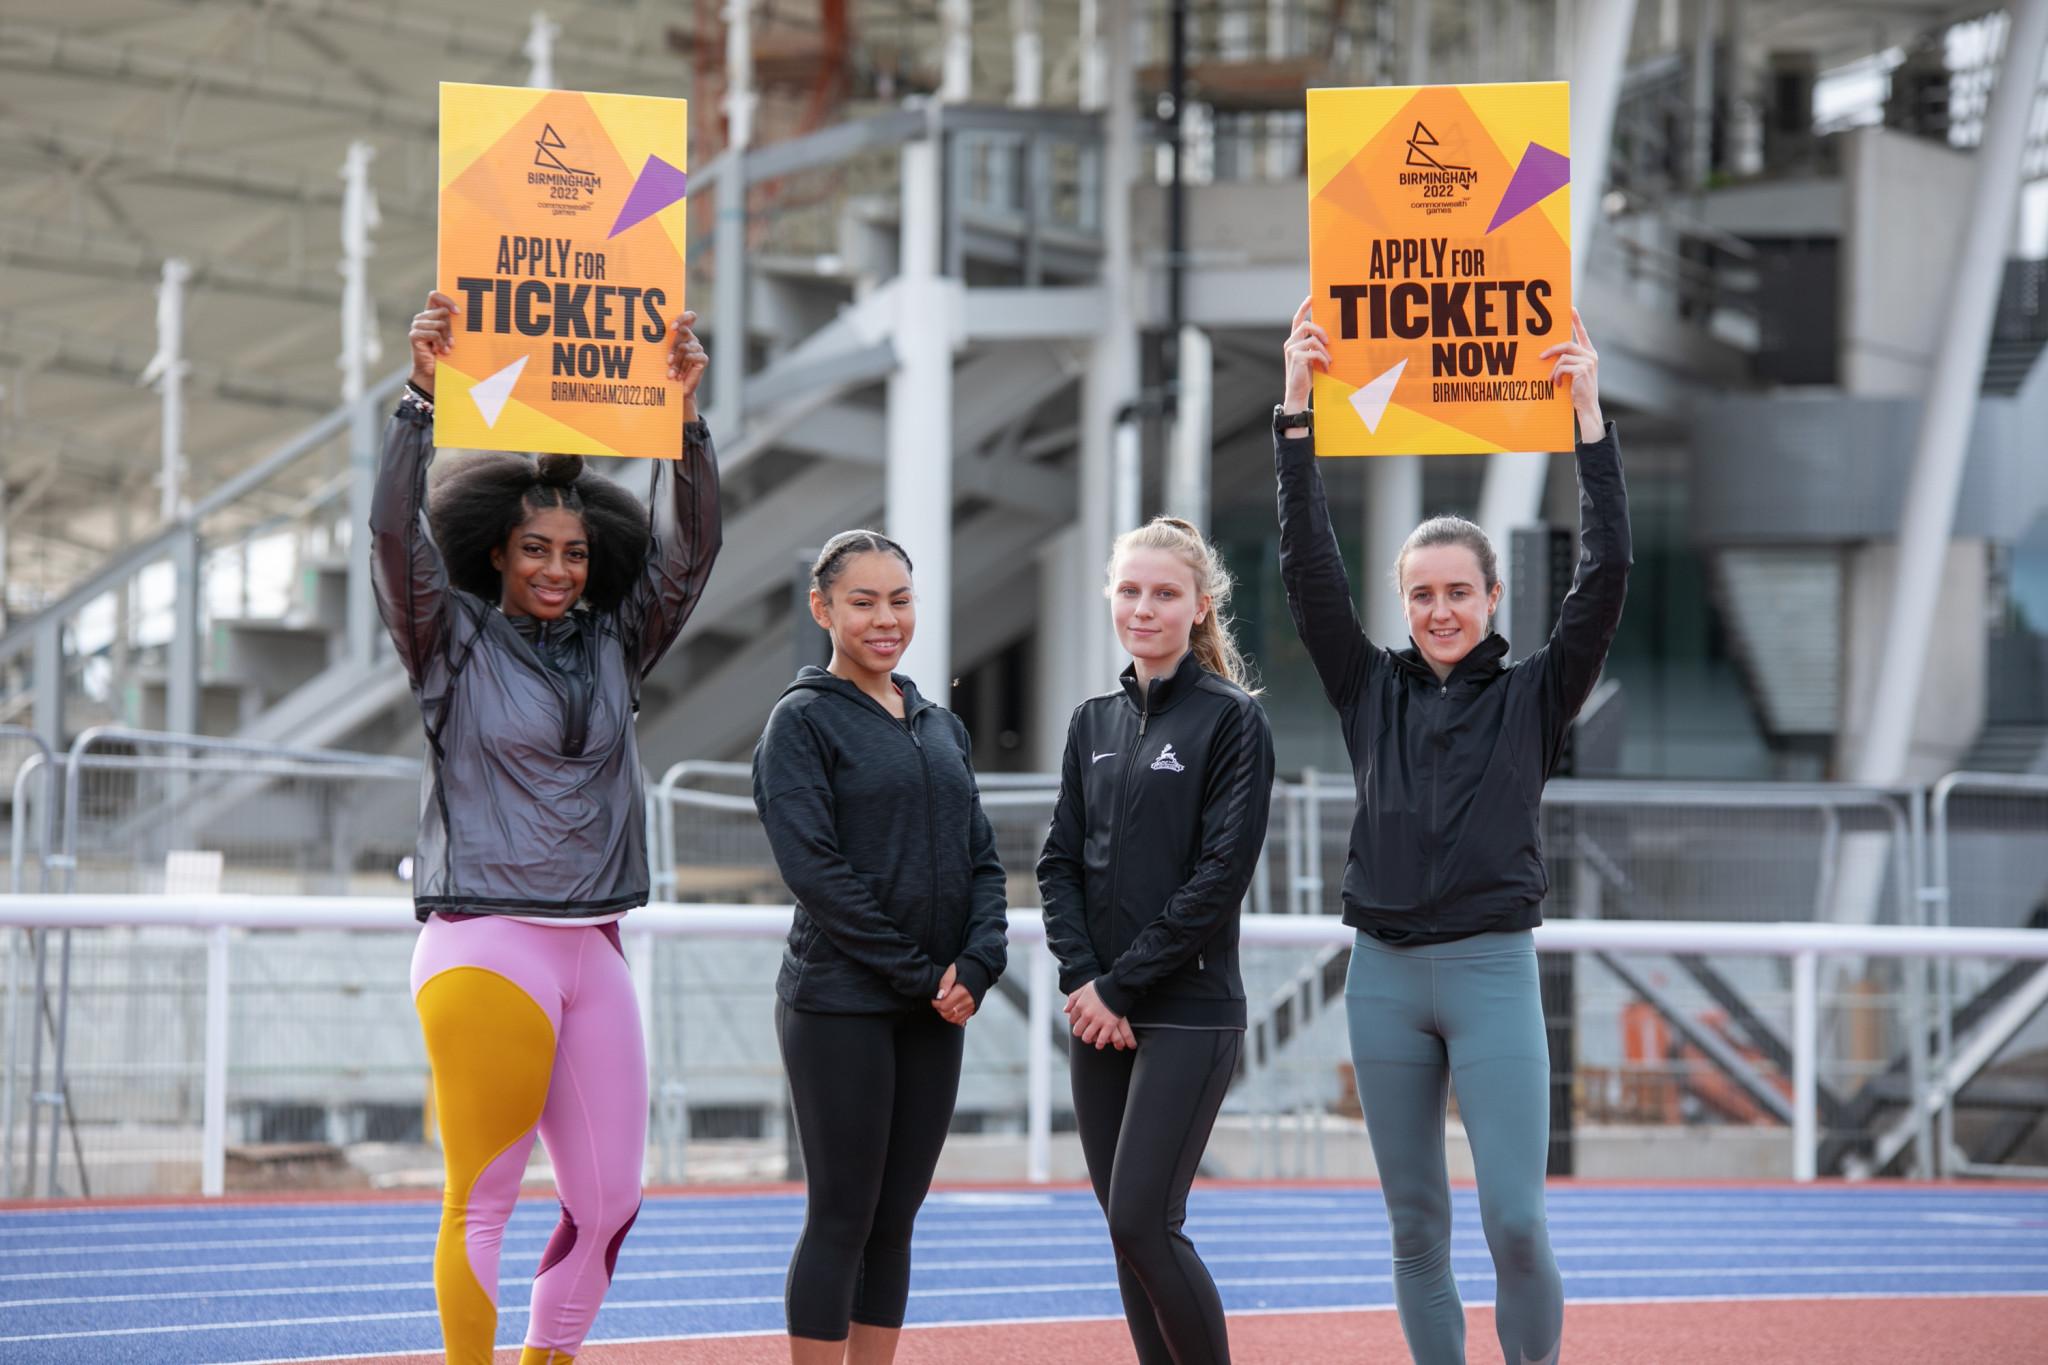 From left athletes Kadeena Cox, Sophia Deans, Amy Harland and Laura Muir at the Alexander Stadium ©Birmingham 2022